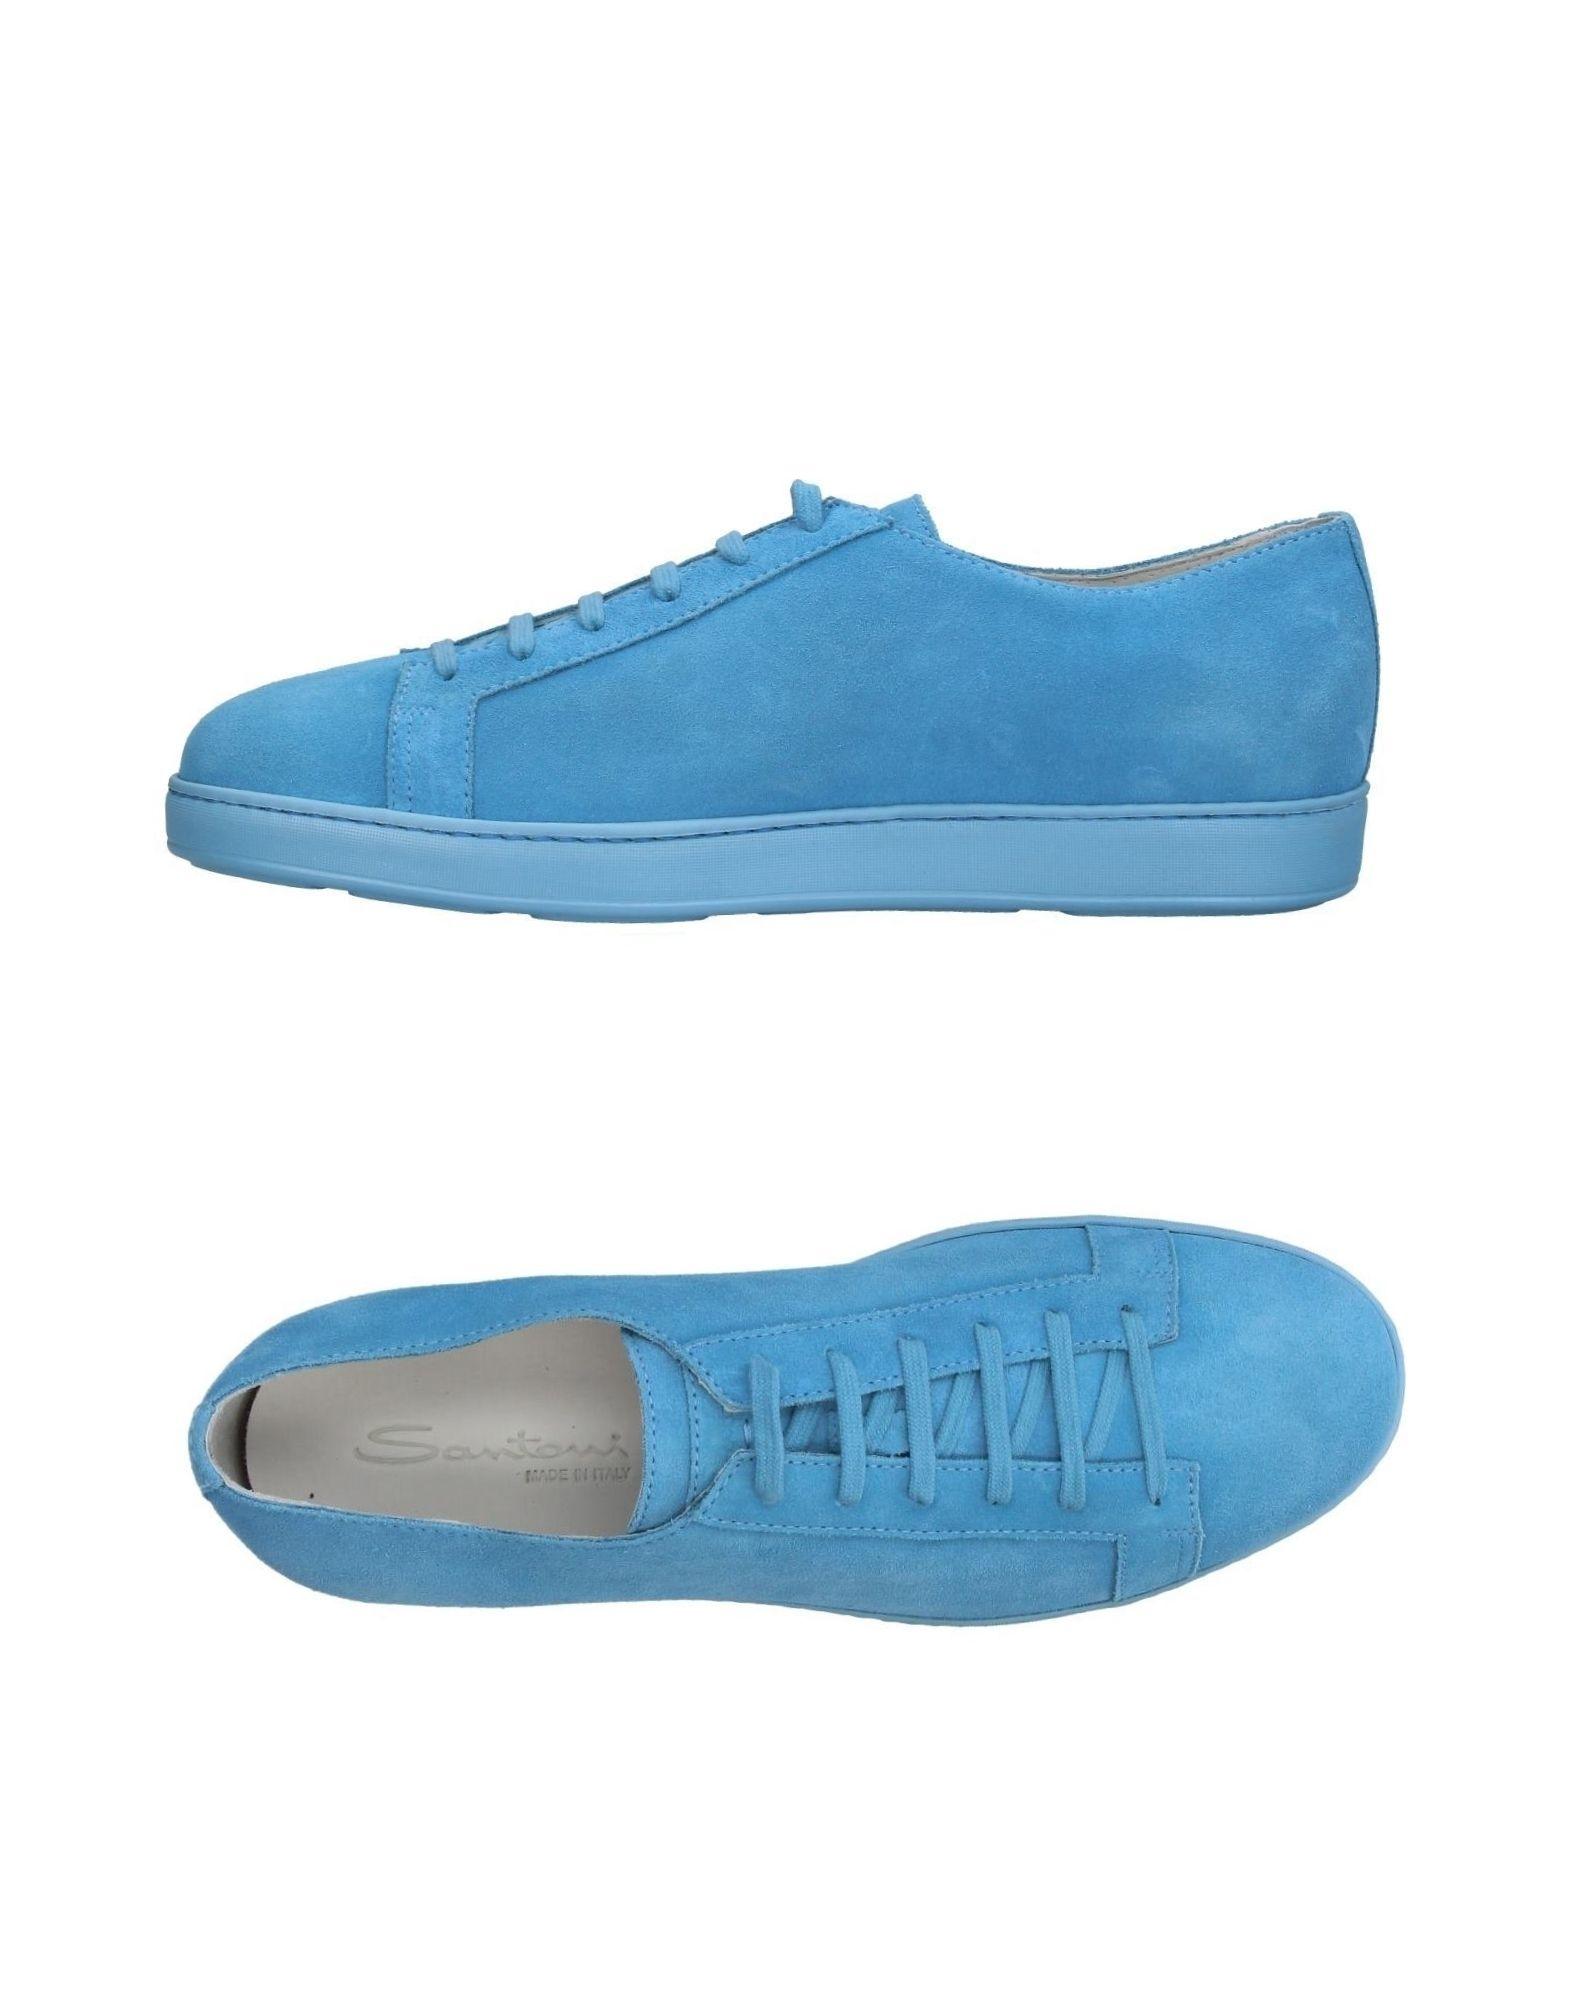 Moda Sneakers Santoni Uomo - 11409490UK